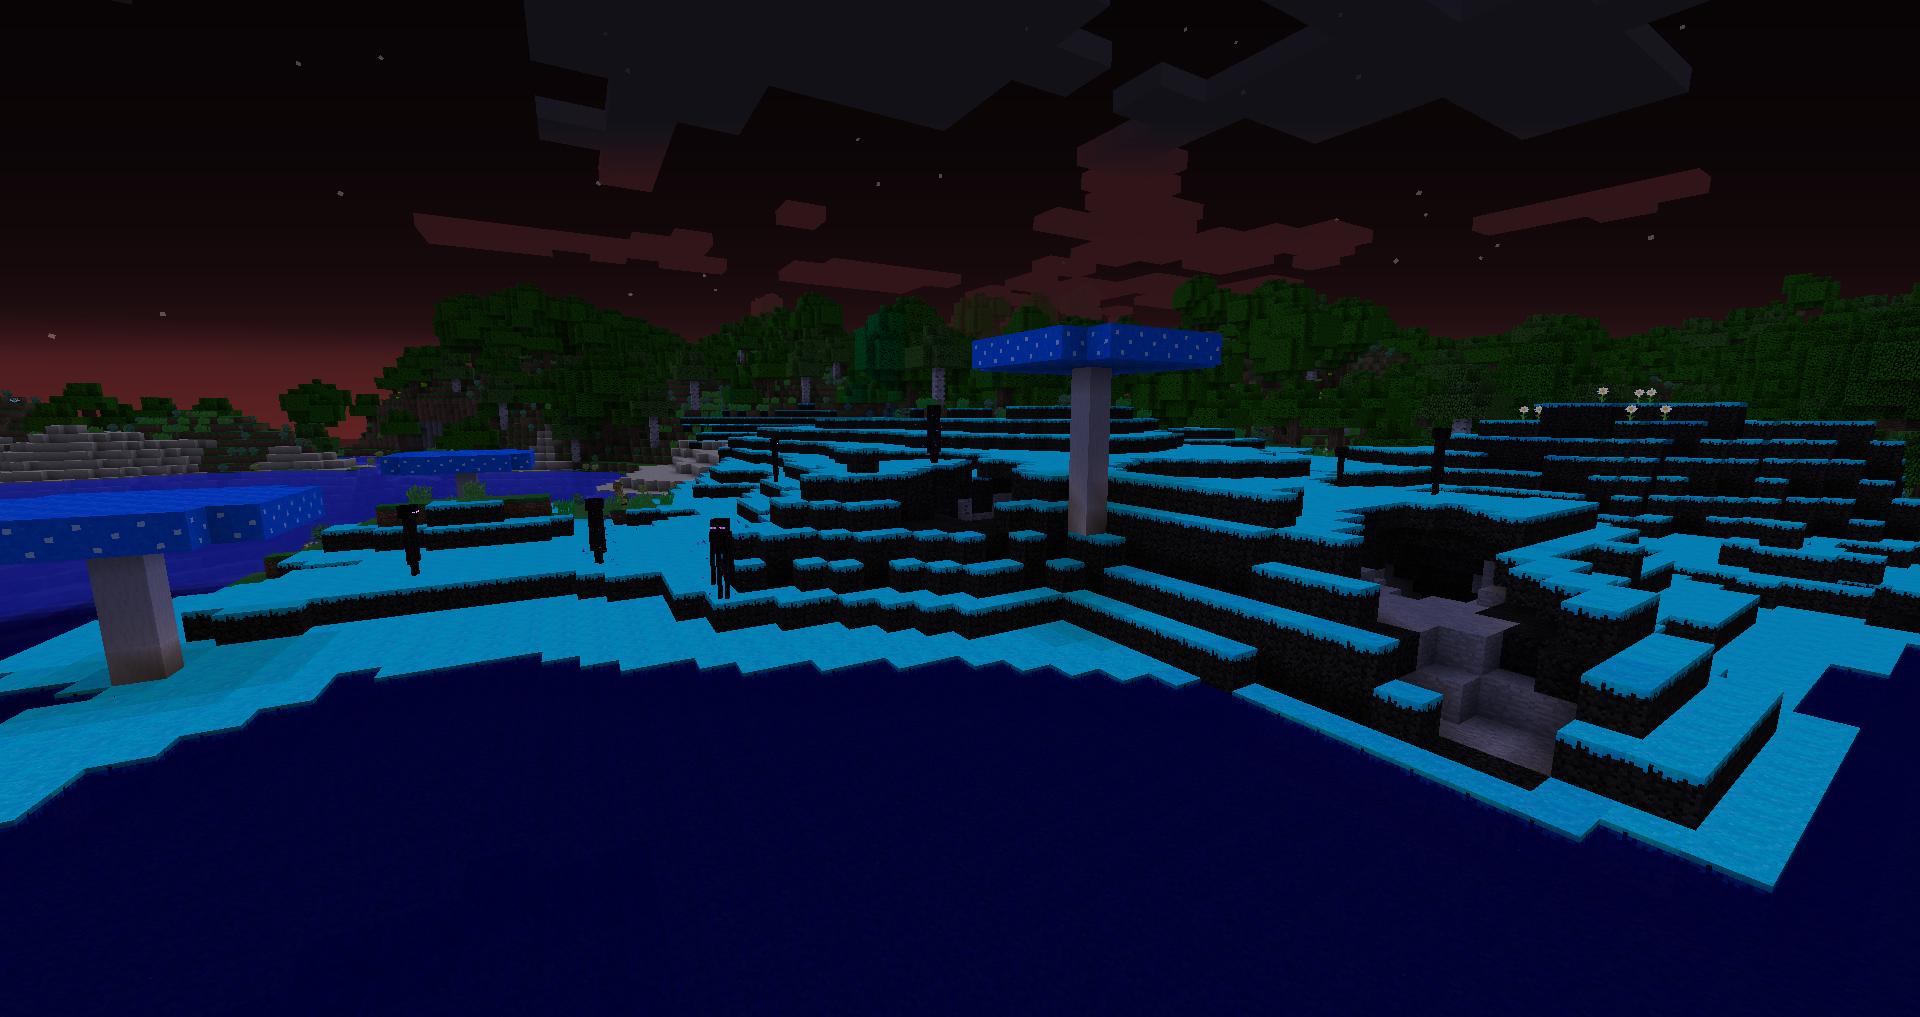 glowshroomlands